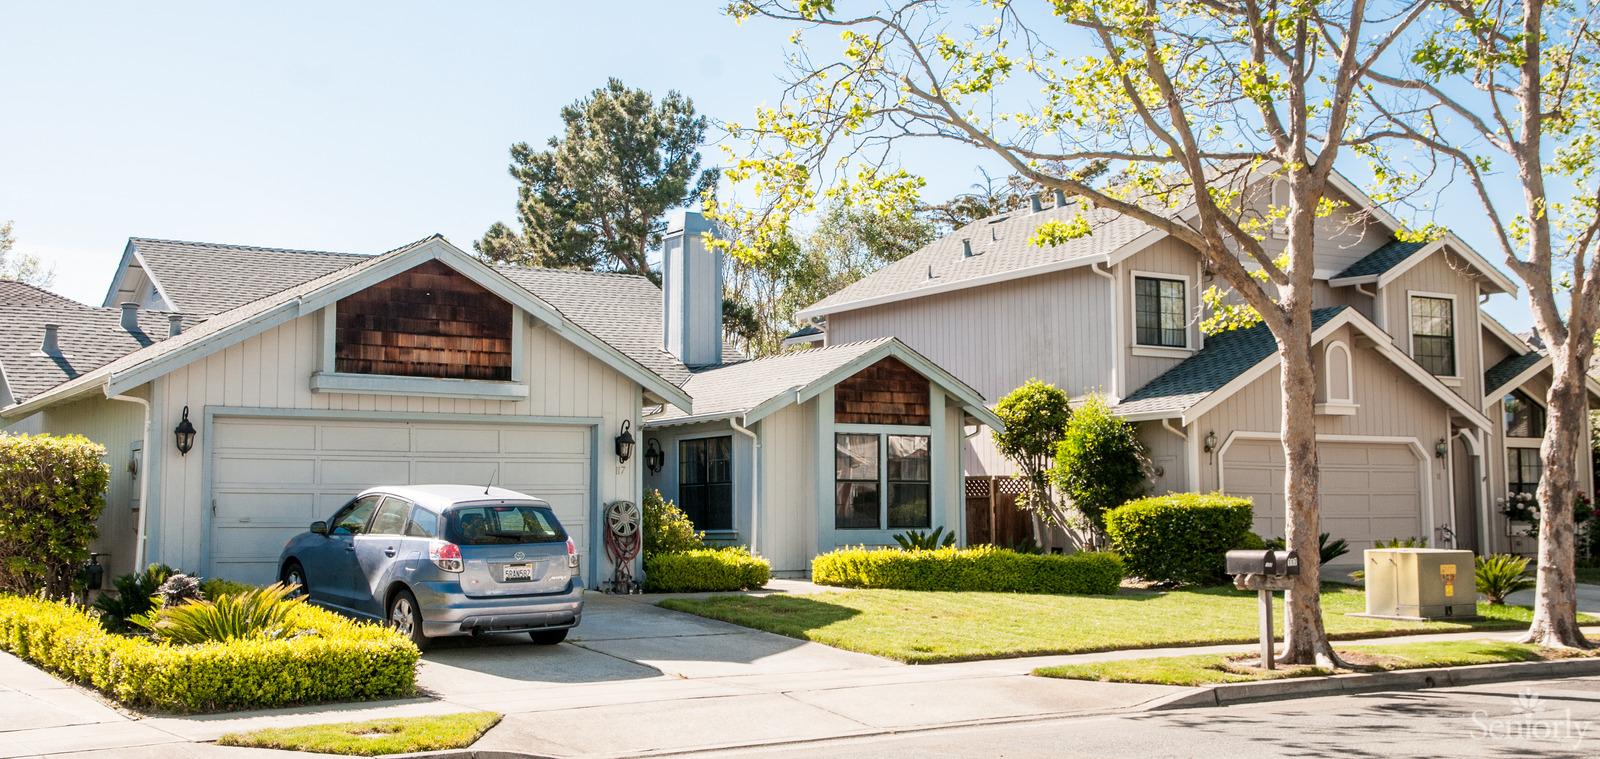 Golden Age Bayside Alameda CA 1